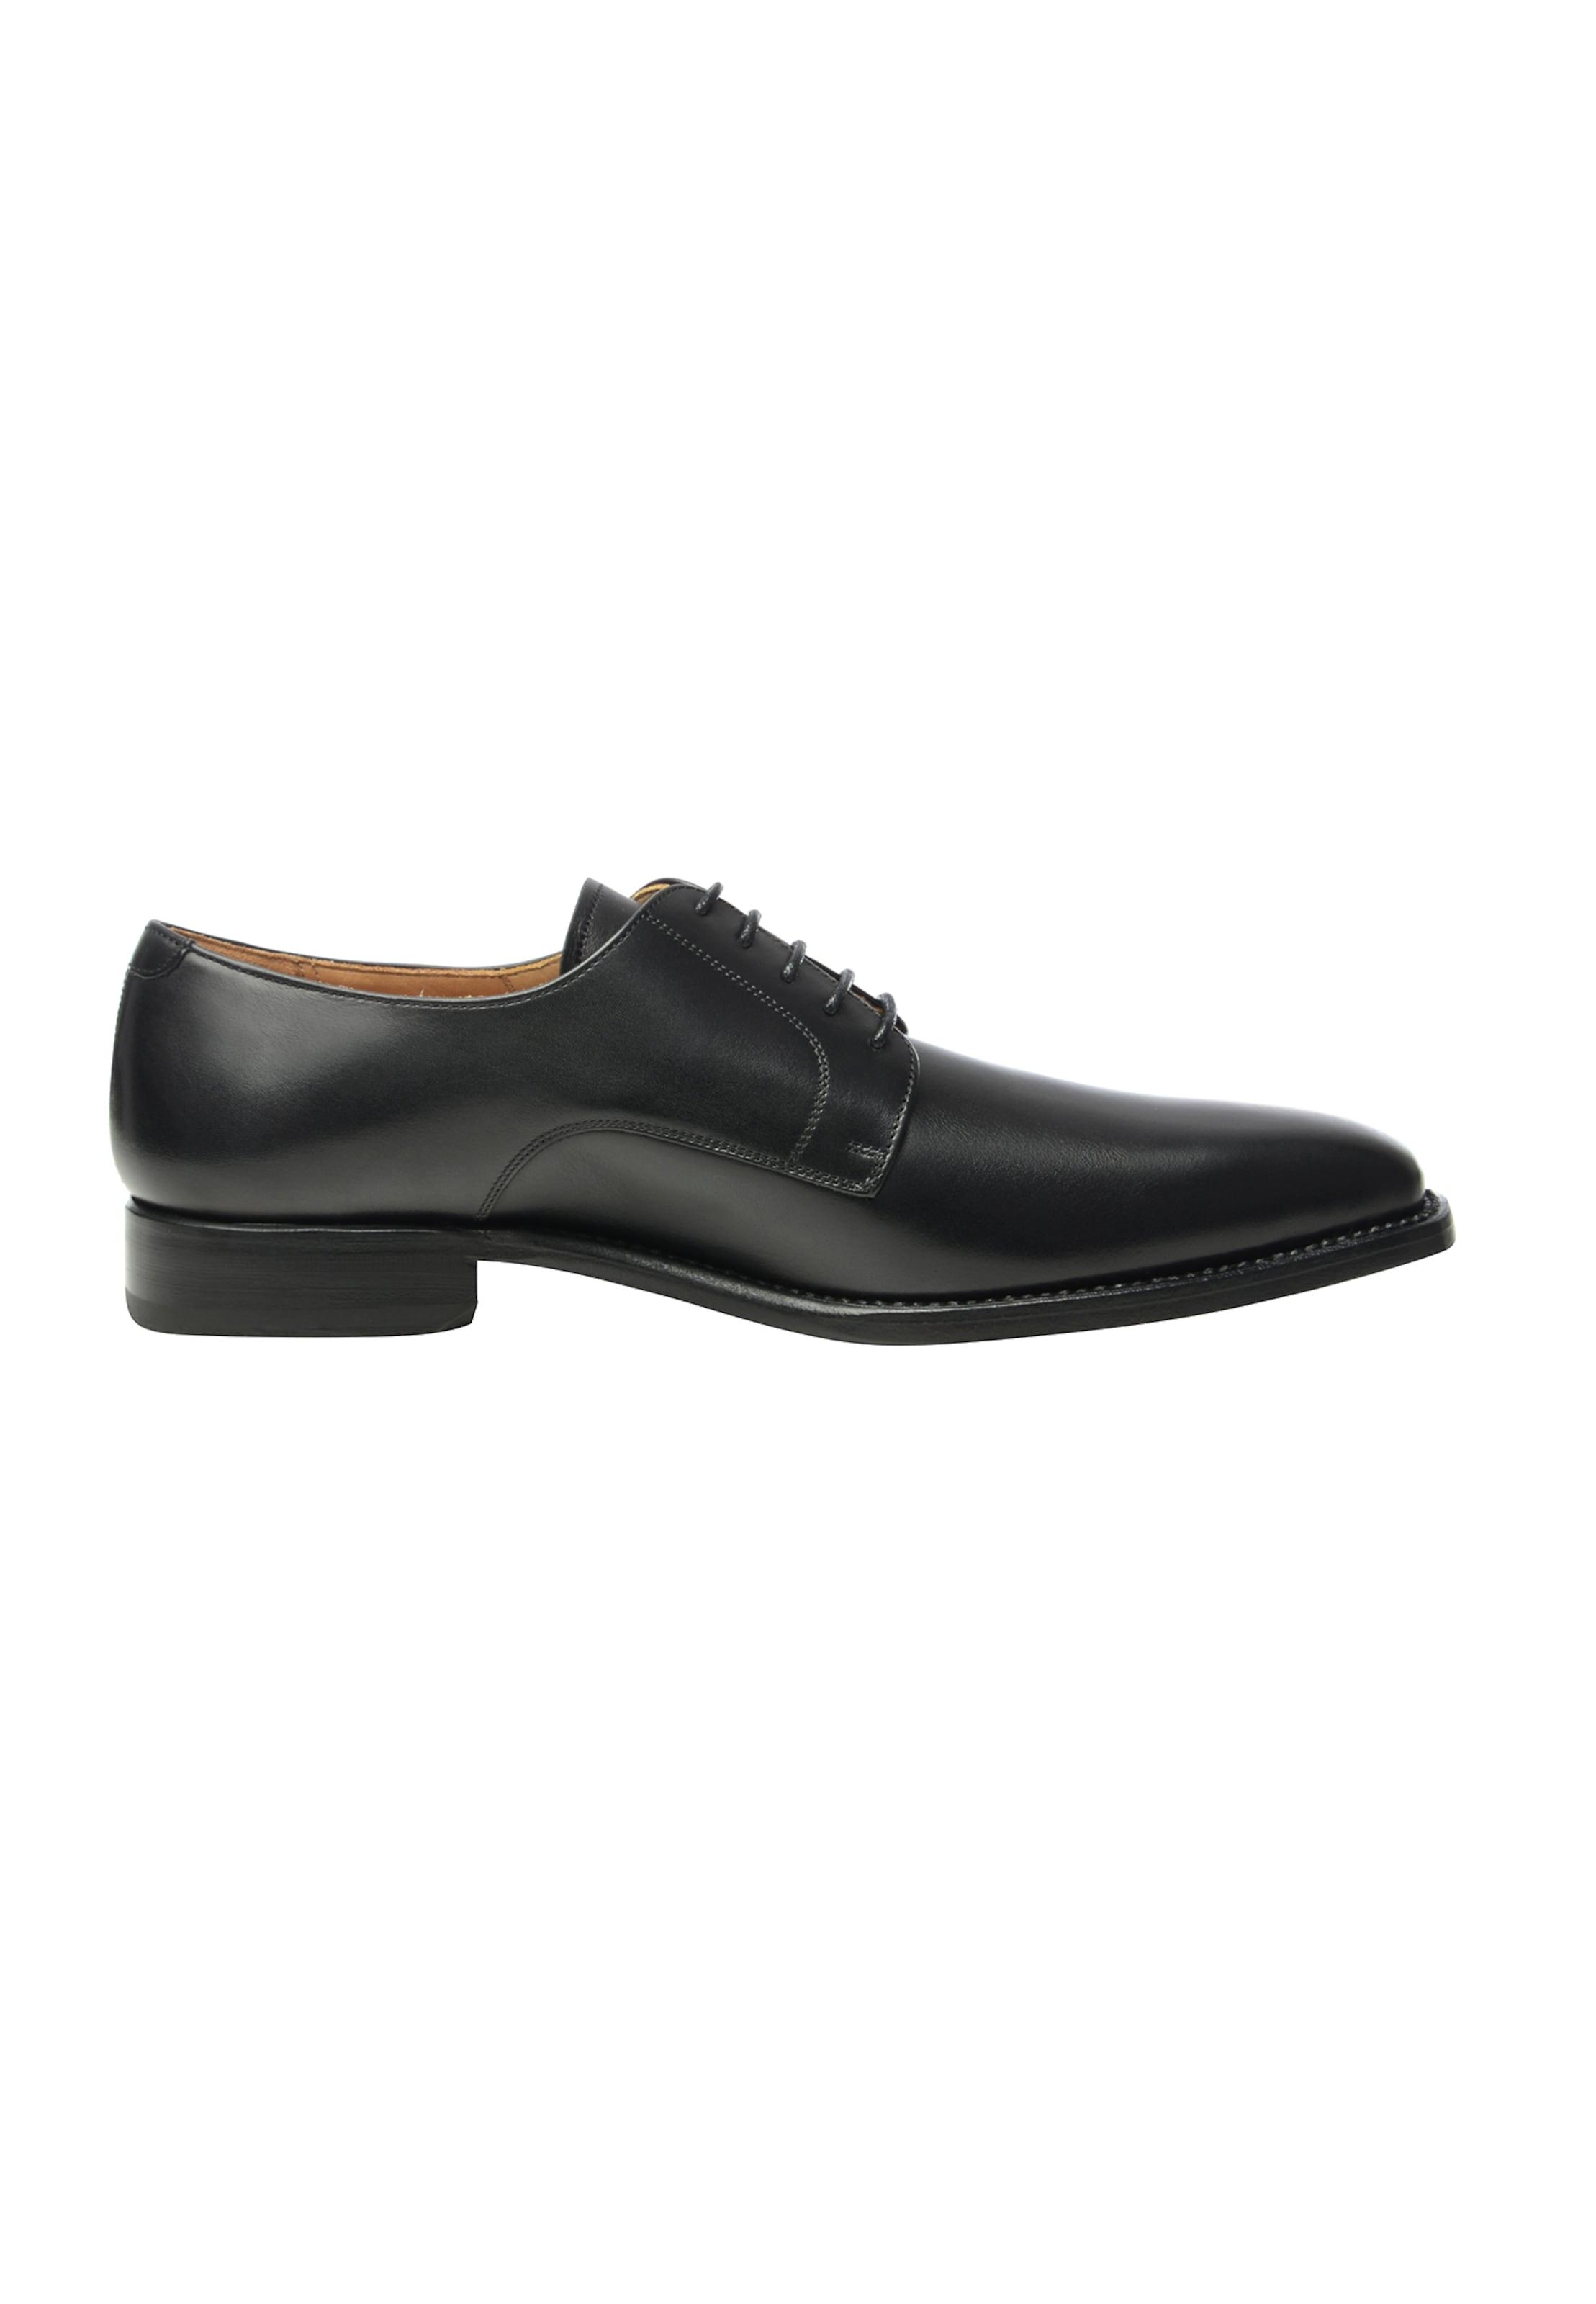 SchuhePASSION SchuhePASSION SchuhePASSION Businessschuhe 'No. 533 Leder Bequem, gut aussehend 660ea8